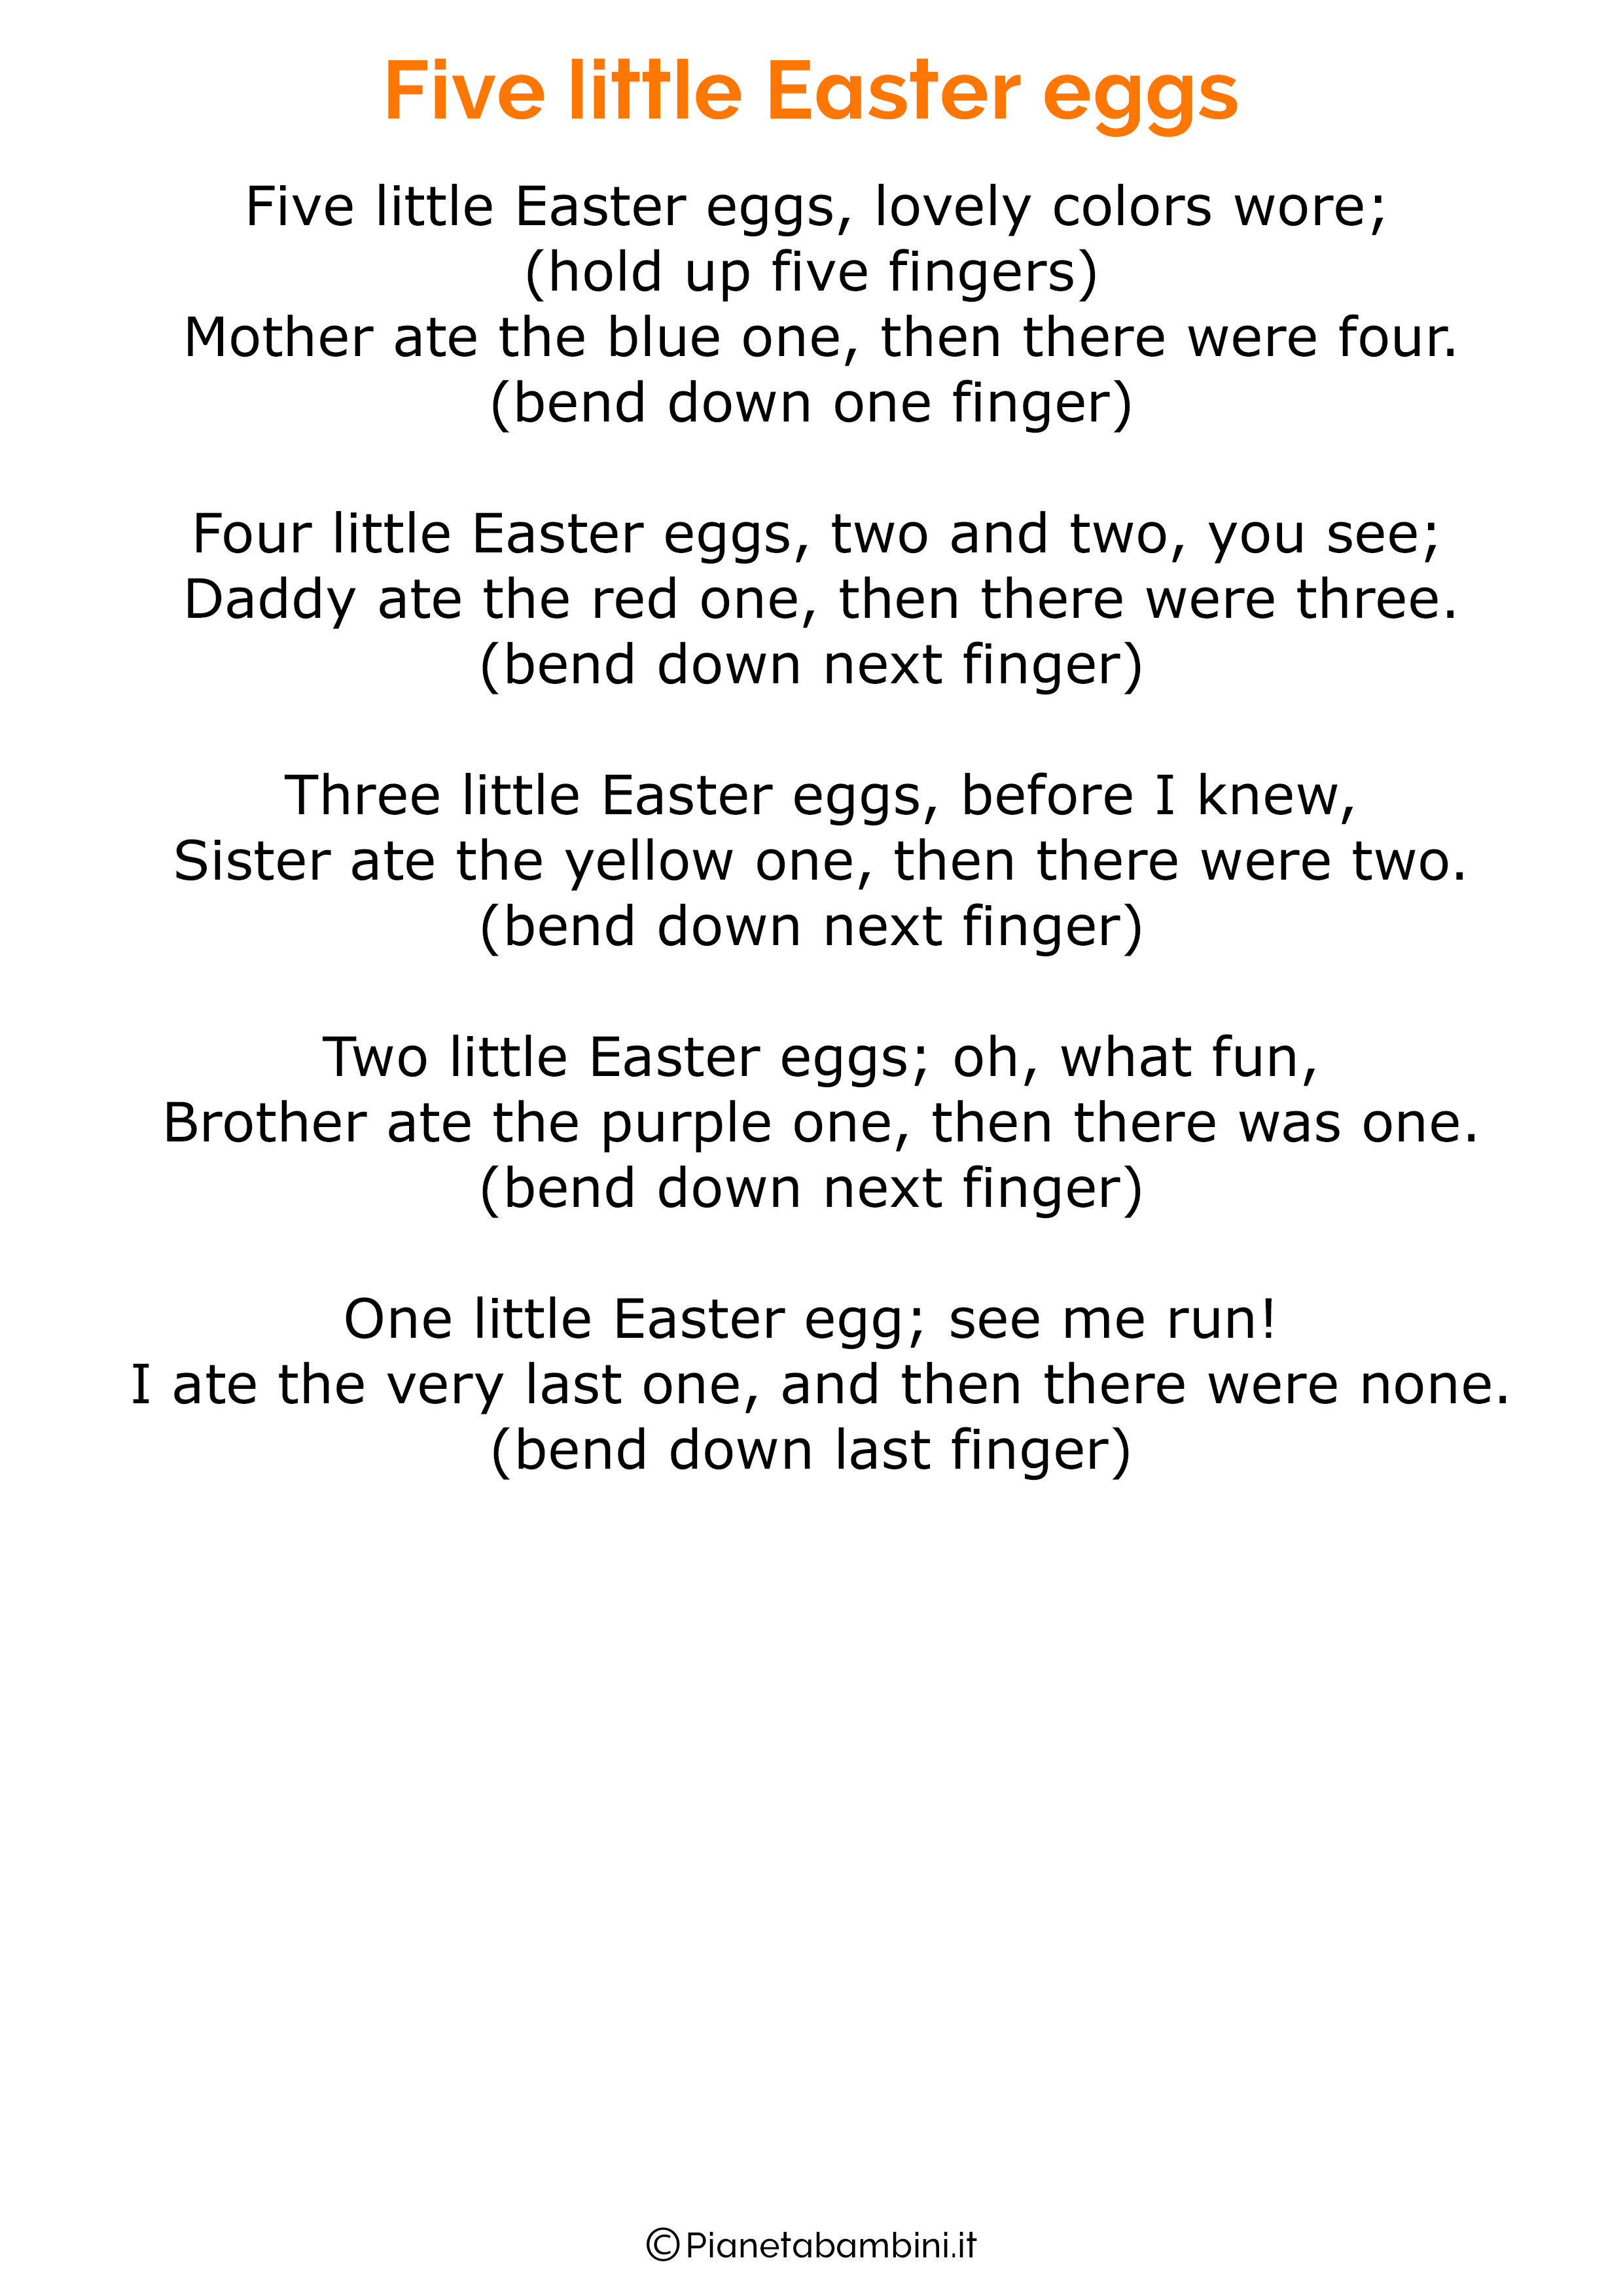 Poesie di Pasqua in inglese per bambini 01